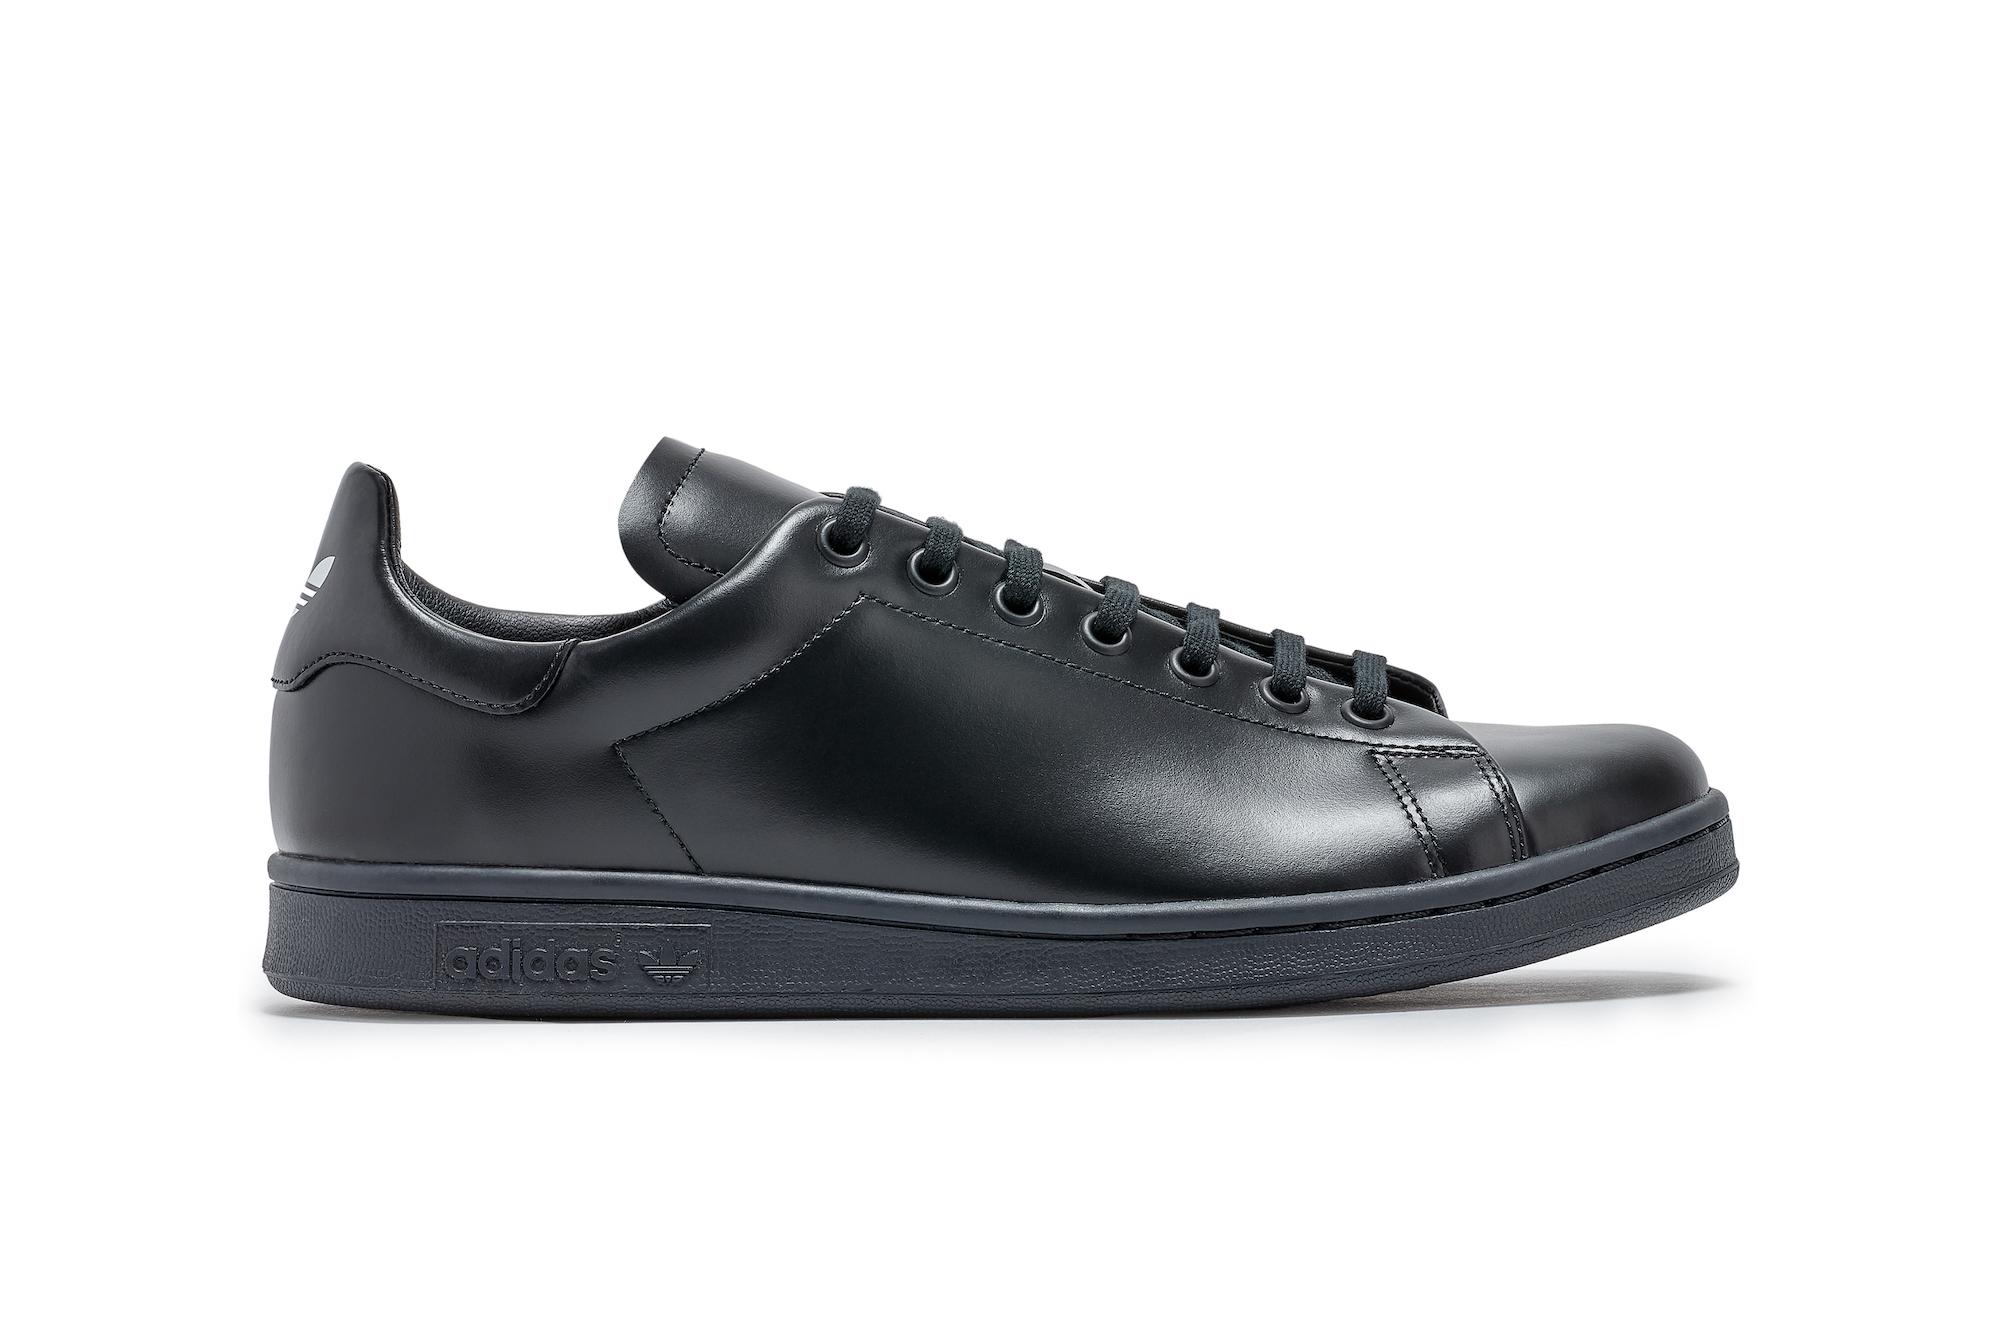 Dover Street Market adidas Originals Black White Stan Smith